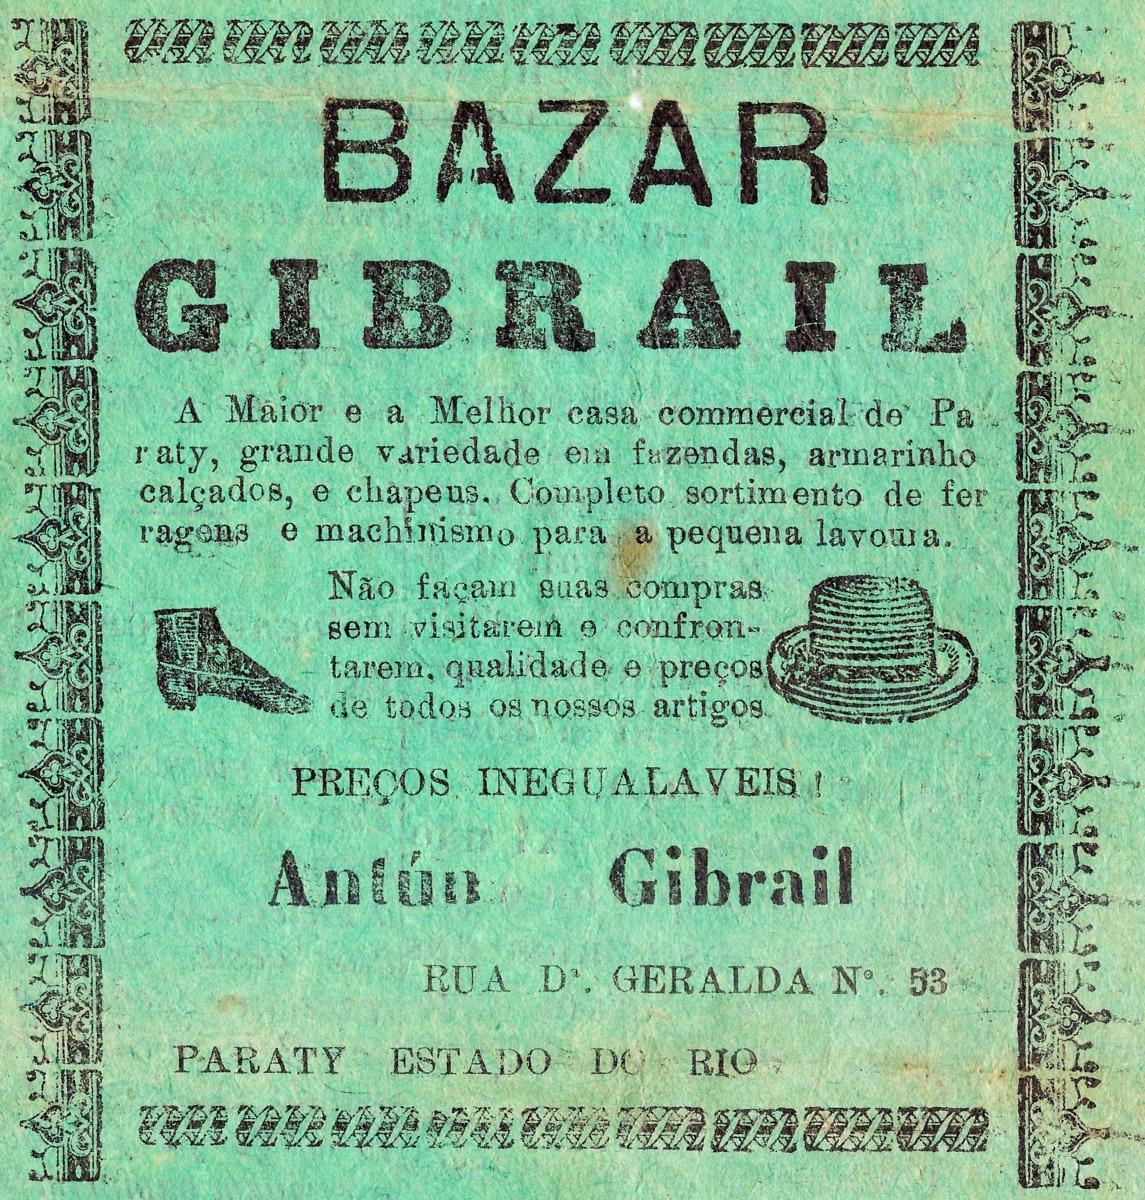 Propaganda antiga do Bazar Gibrail veiculada em 1932